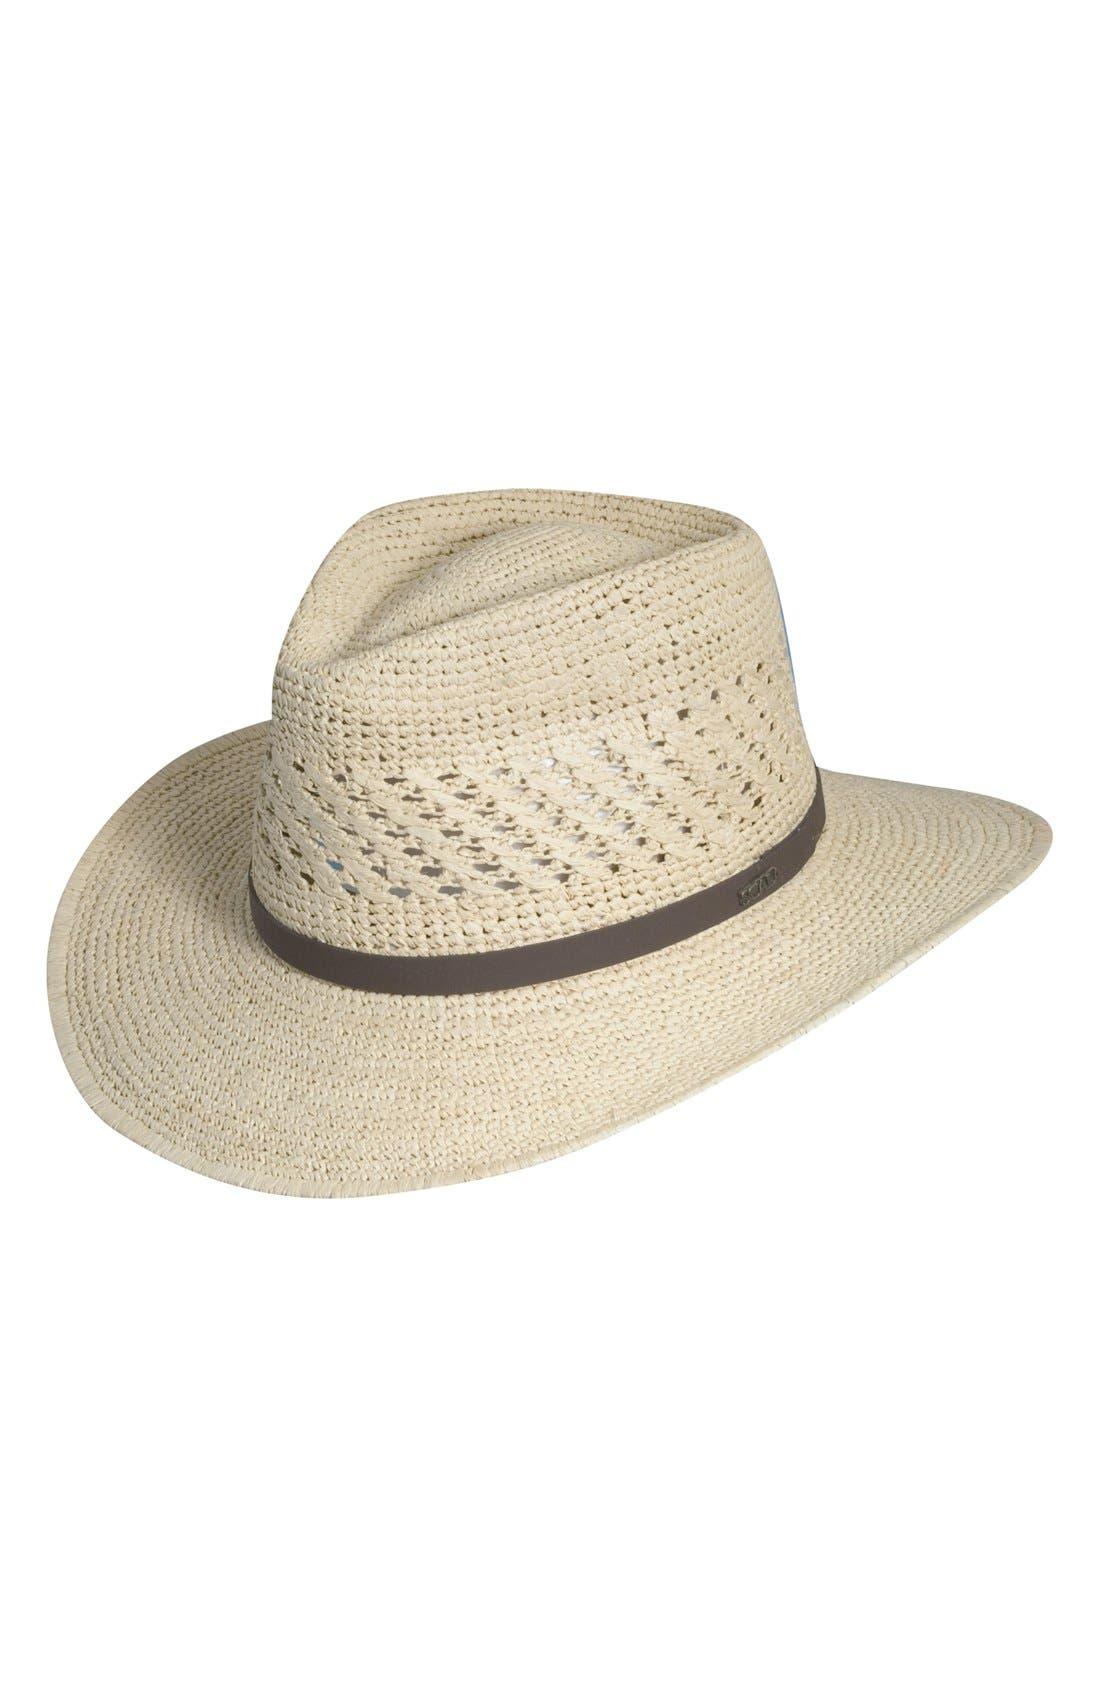 Straw Outback Hat,                             Main thumbnail 1, color,                             Natural